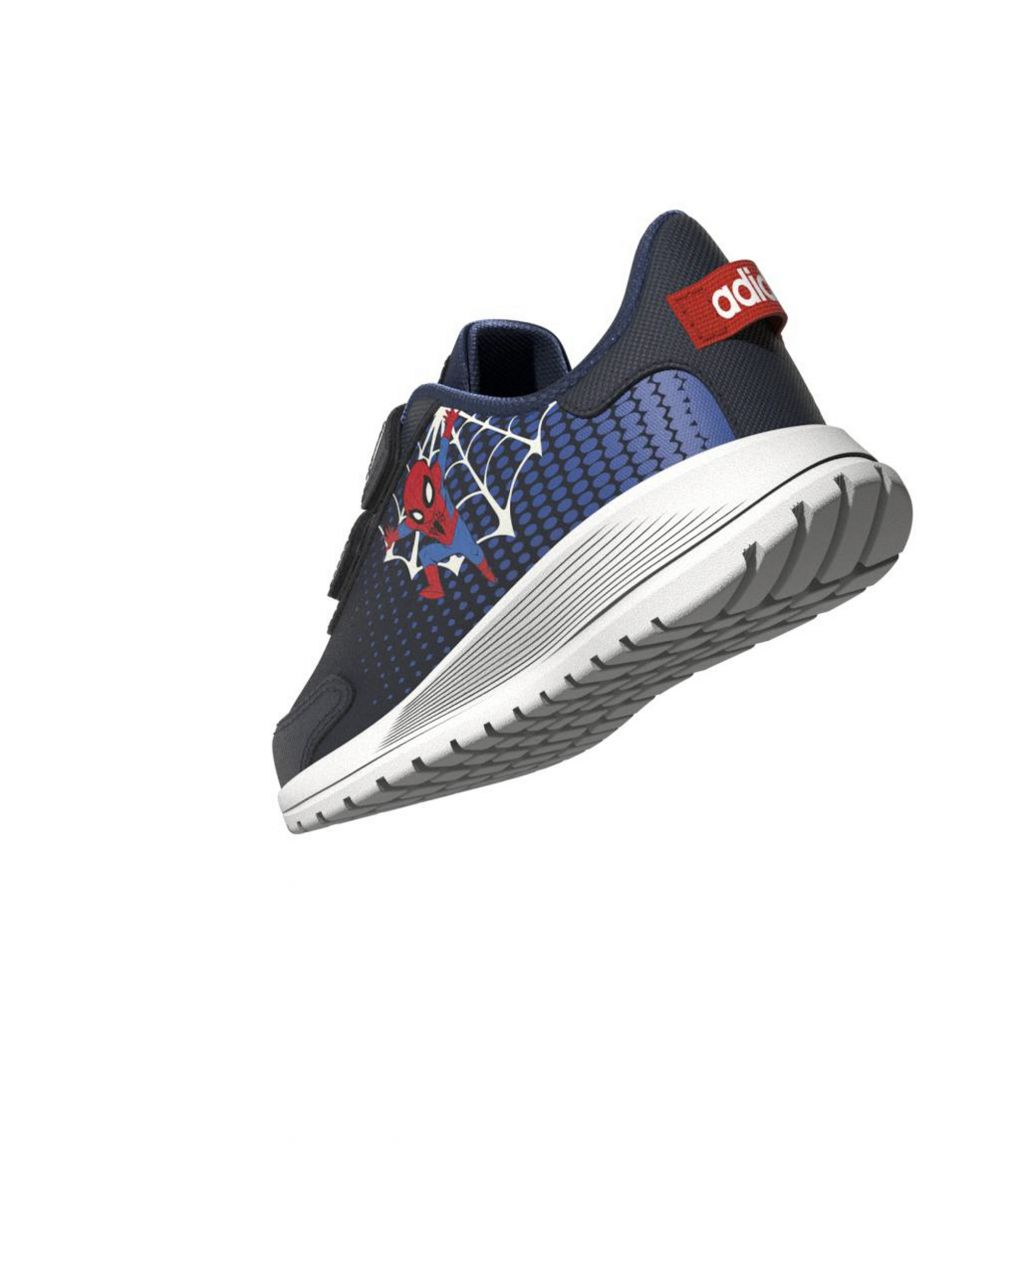 Marvel tensaur run shoes - Adidas